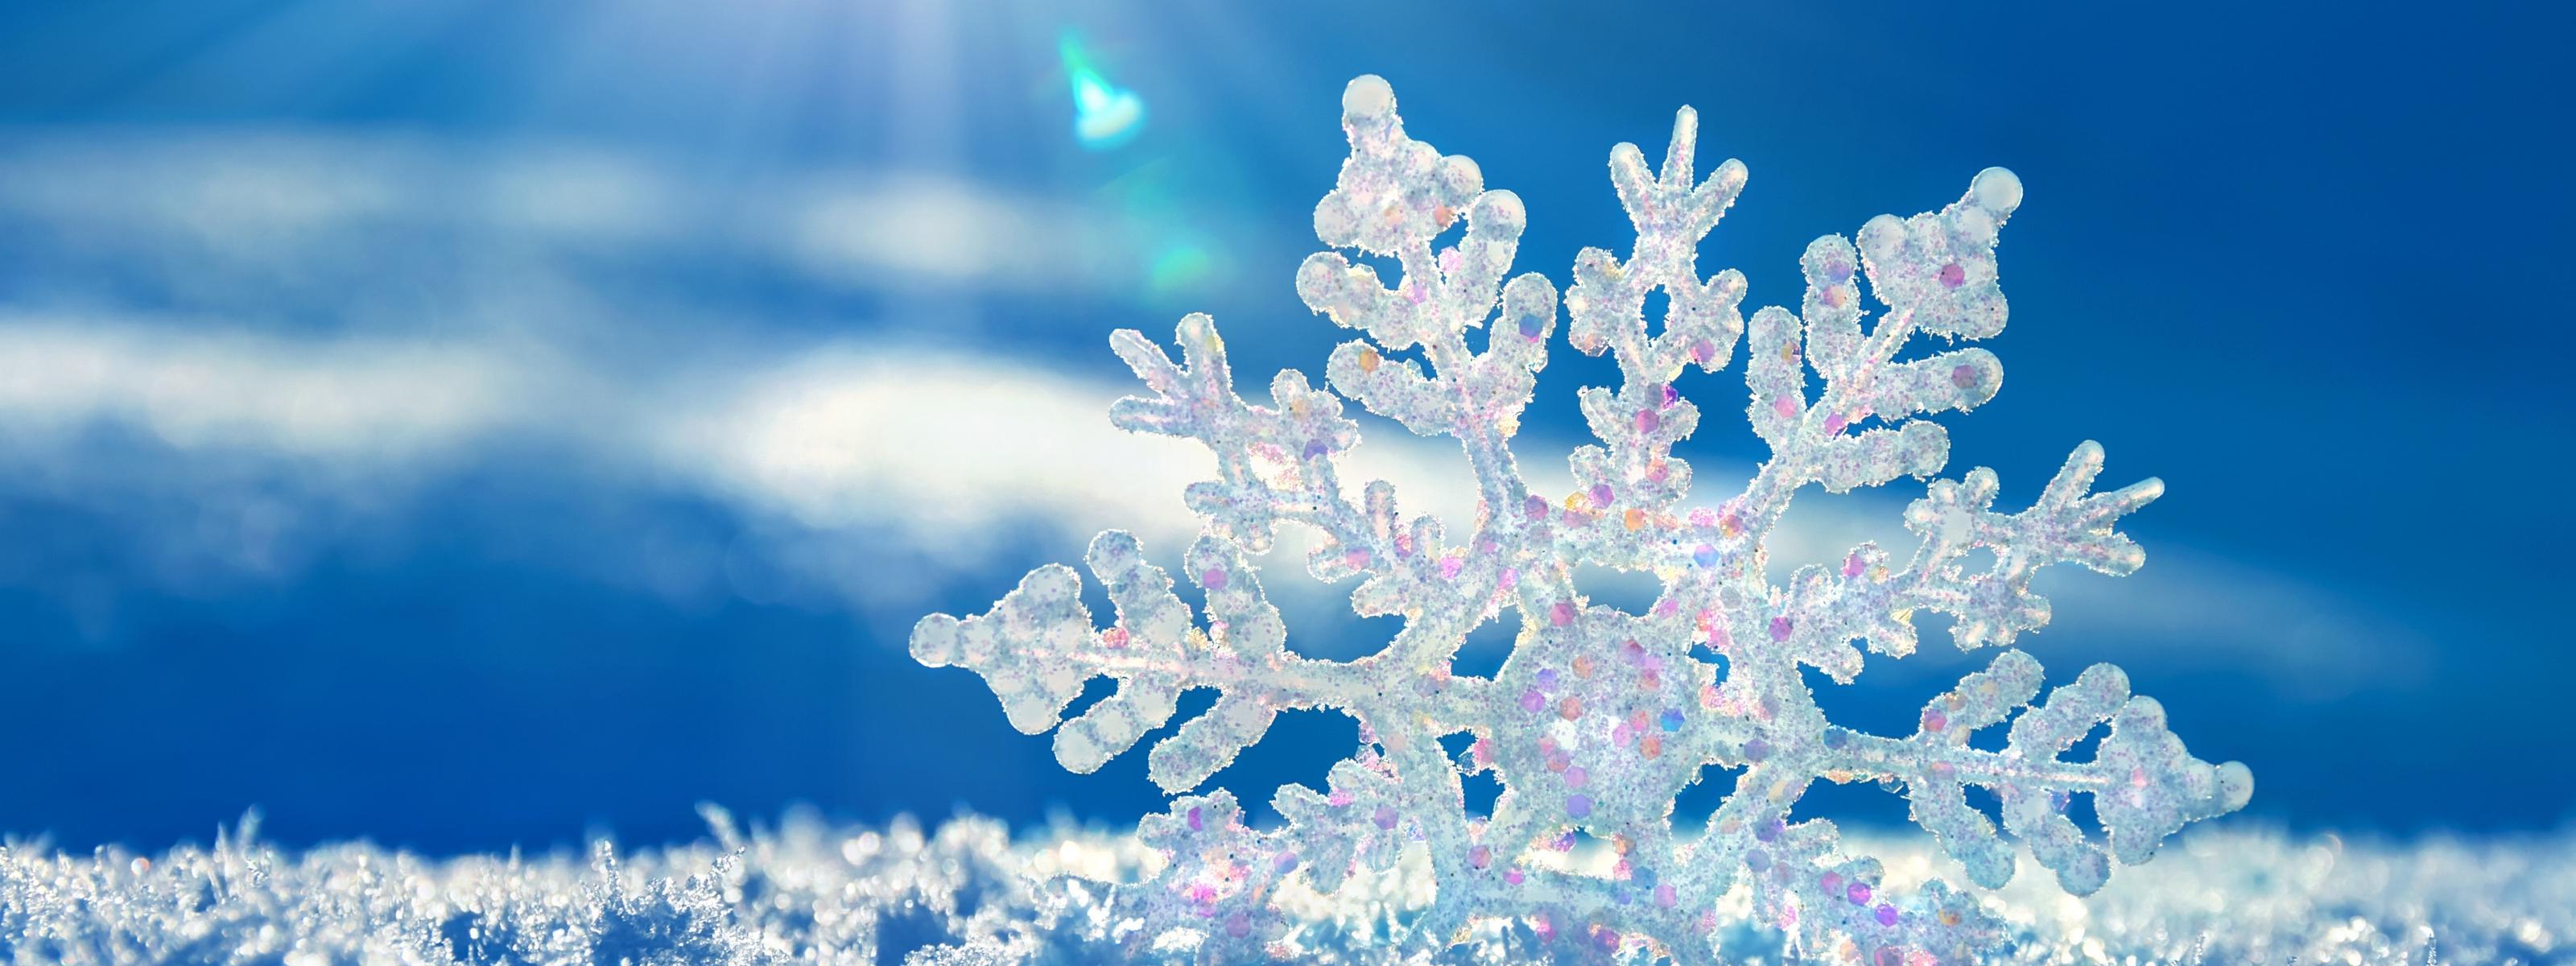 Beautiful Snowflake In The Sunlight